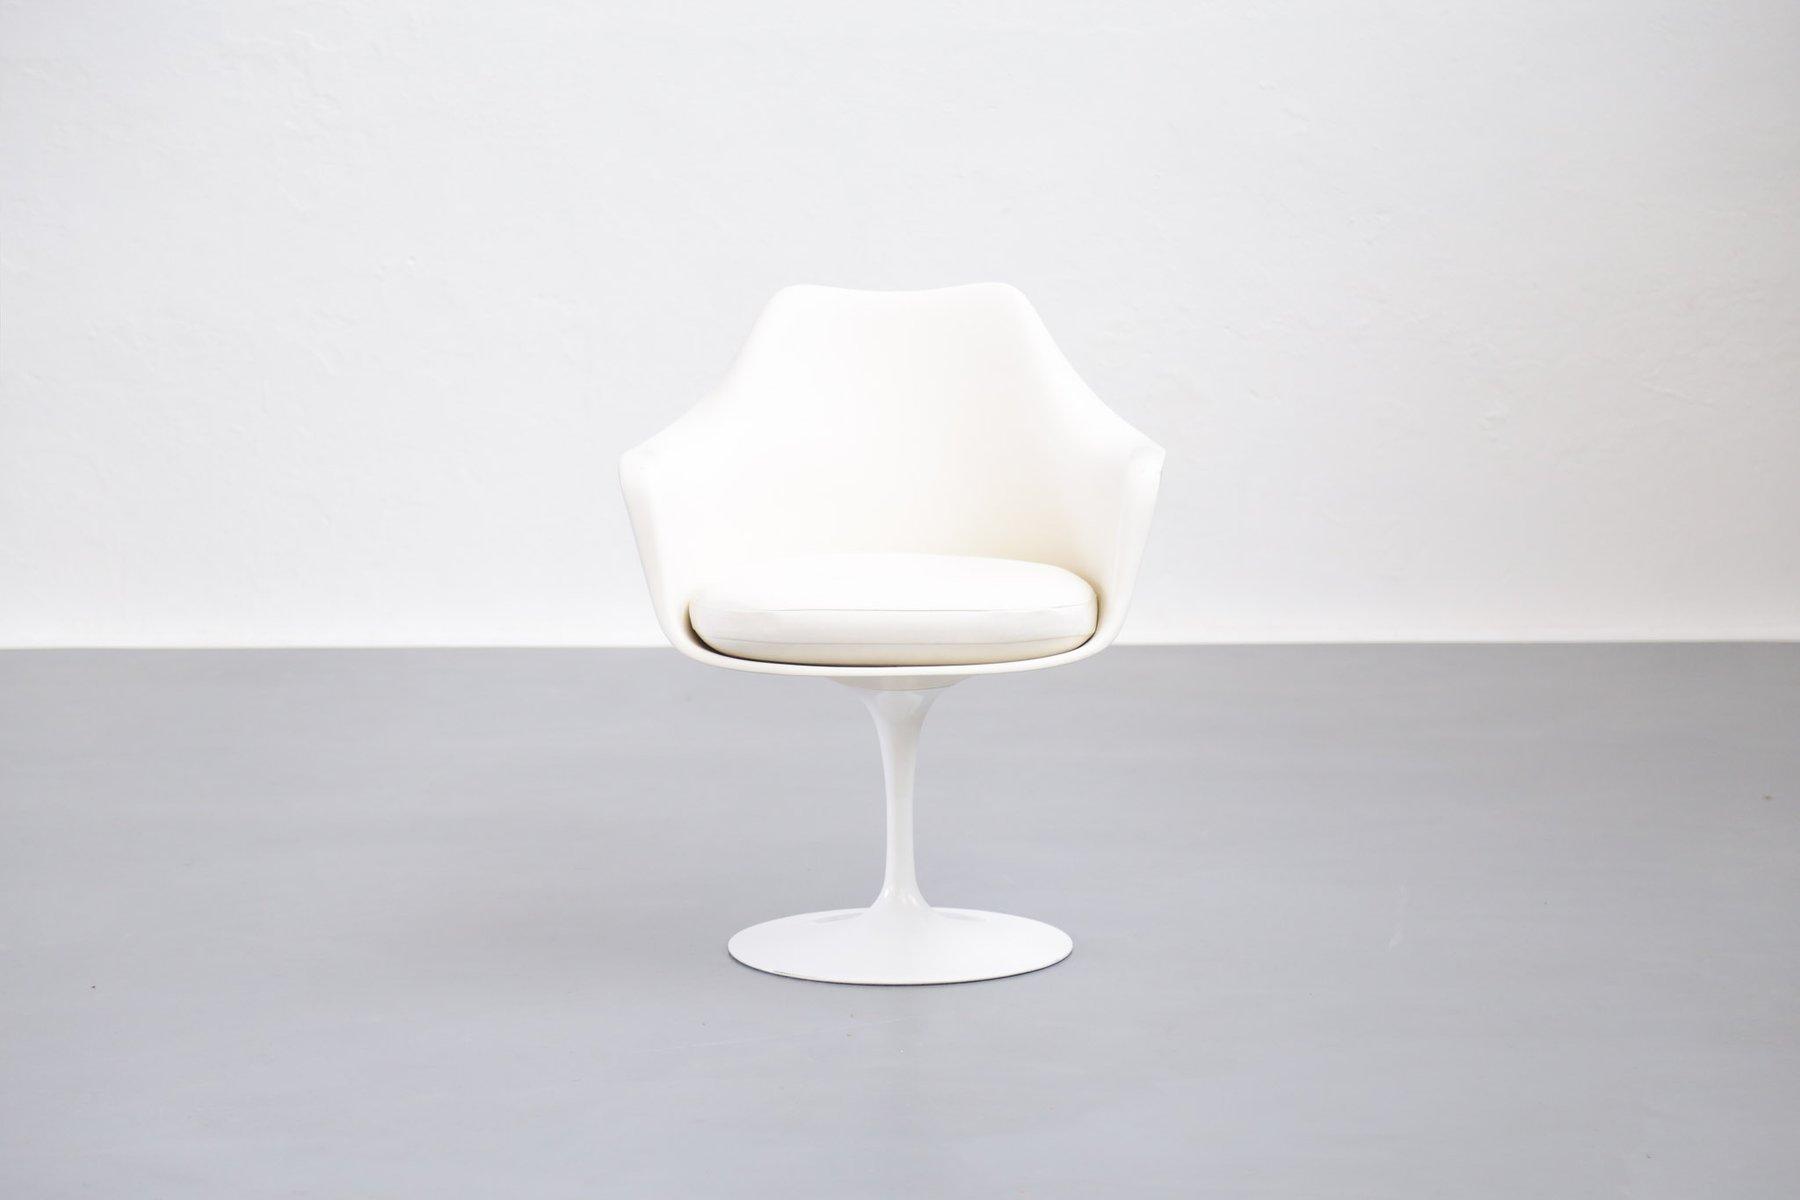 Mid Century International Tulip Arm Chair by Eero Saarinen for